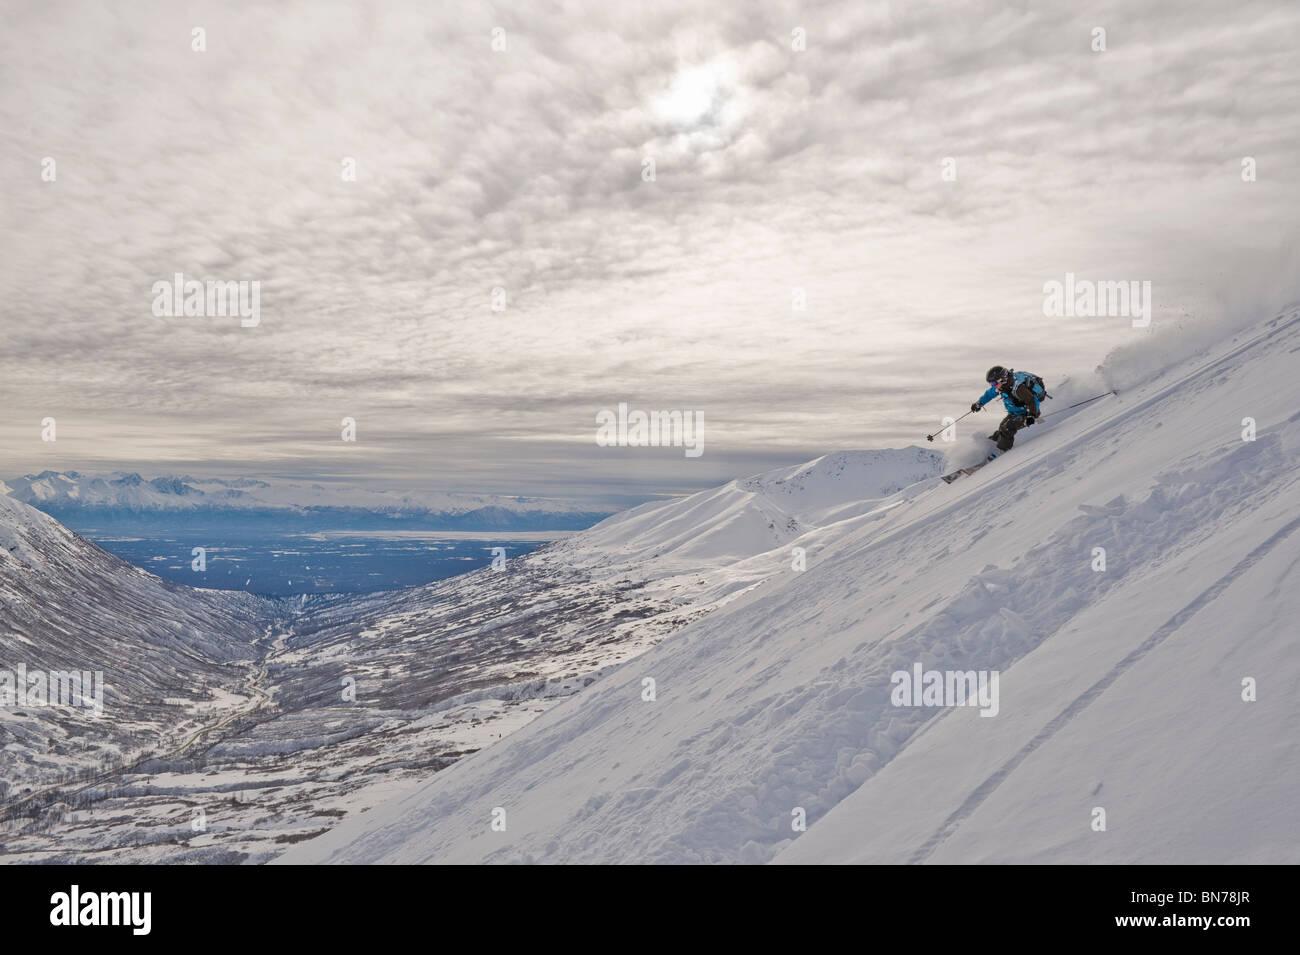 A woman backcountry skier enjoys some powdery turns in Hatcher Pass, Alaska - Stock Image